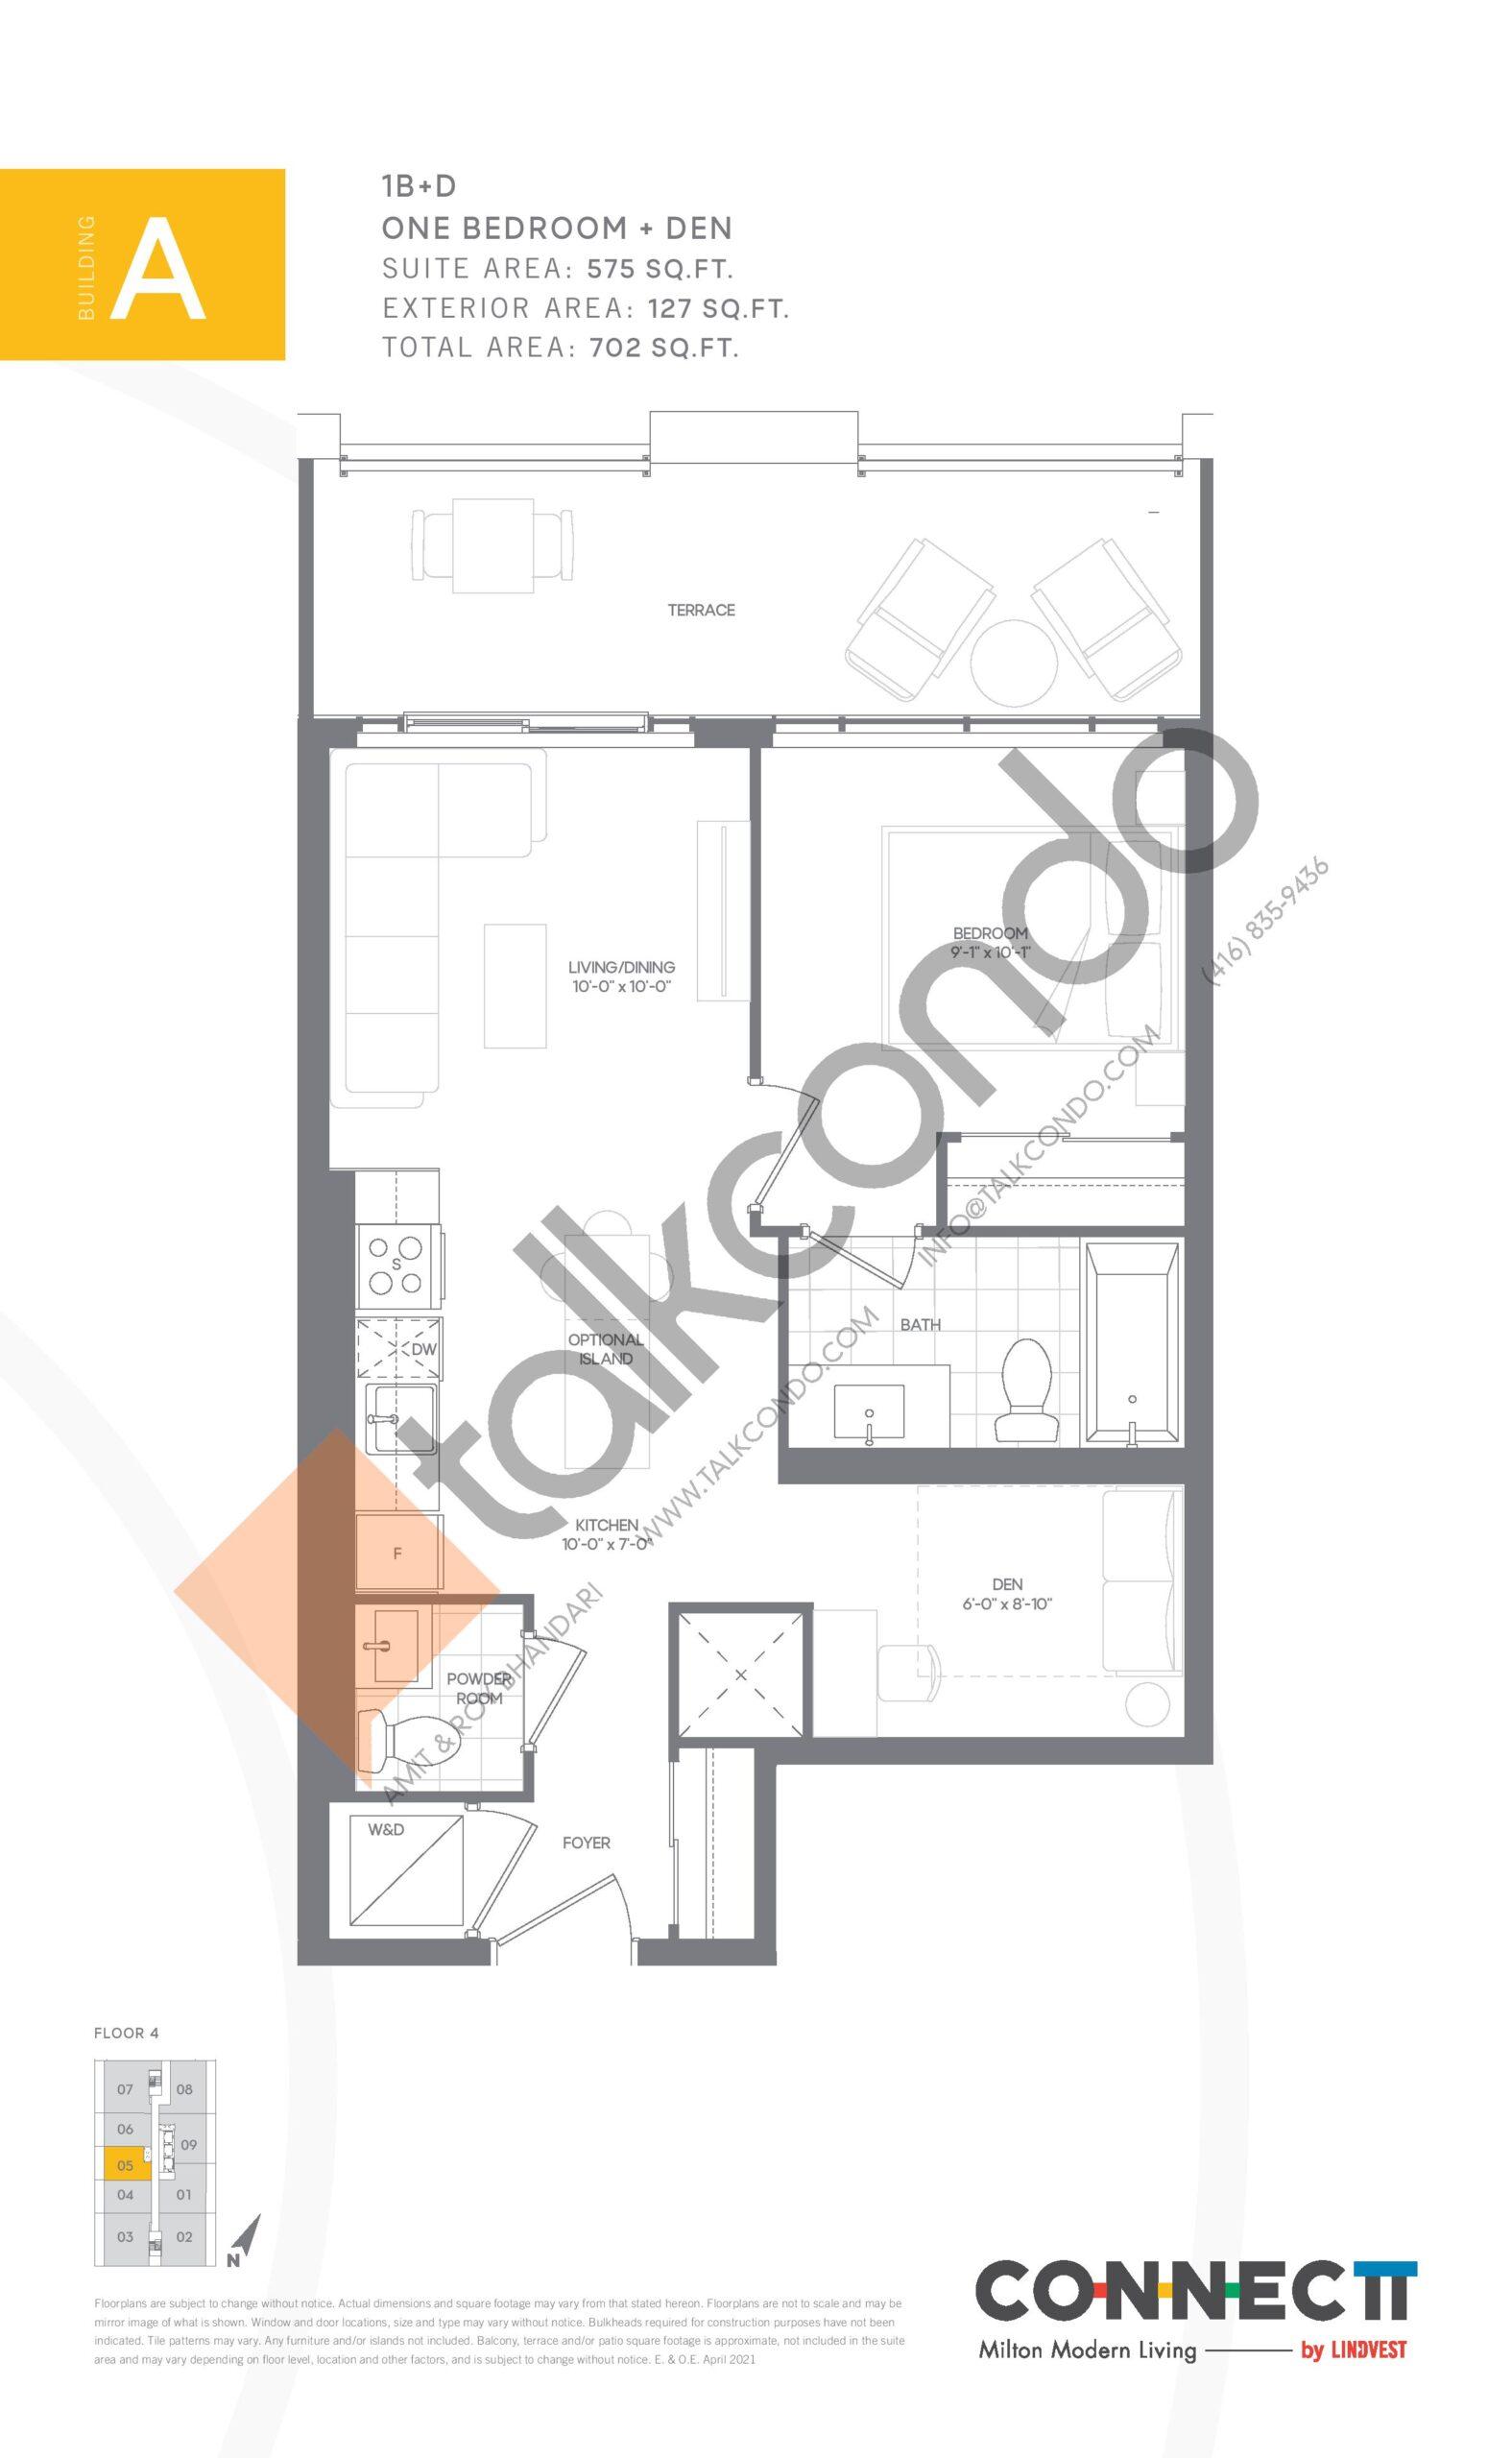 1B+D Floor Plan at Connectt Urban Community Condos - 575 sq.ft